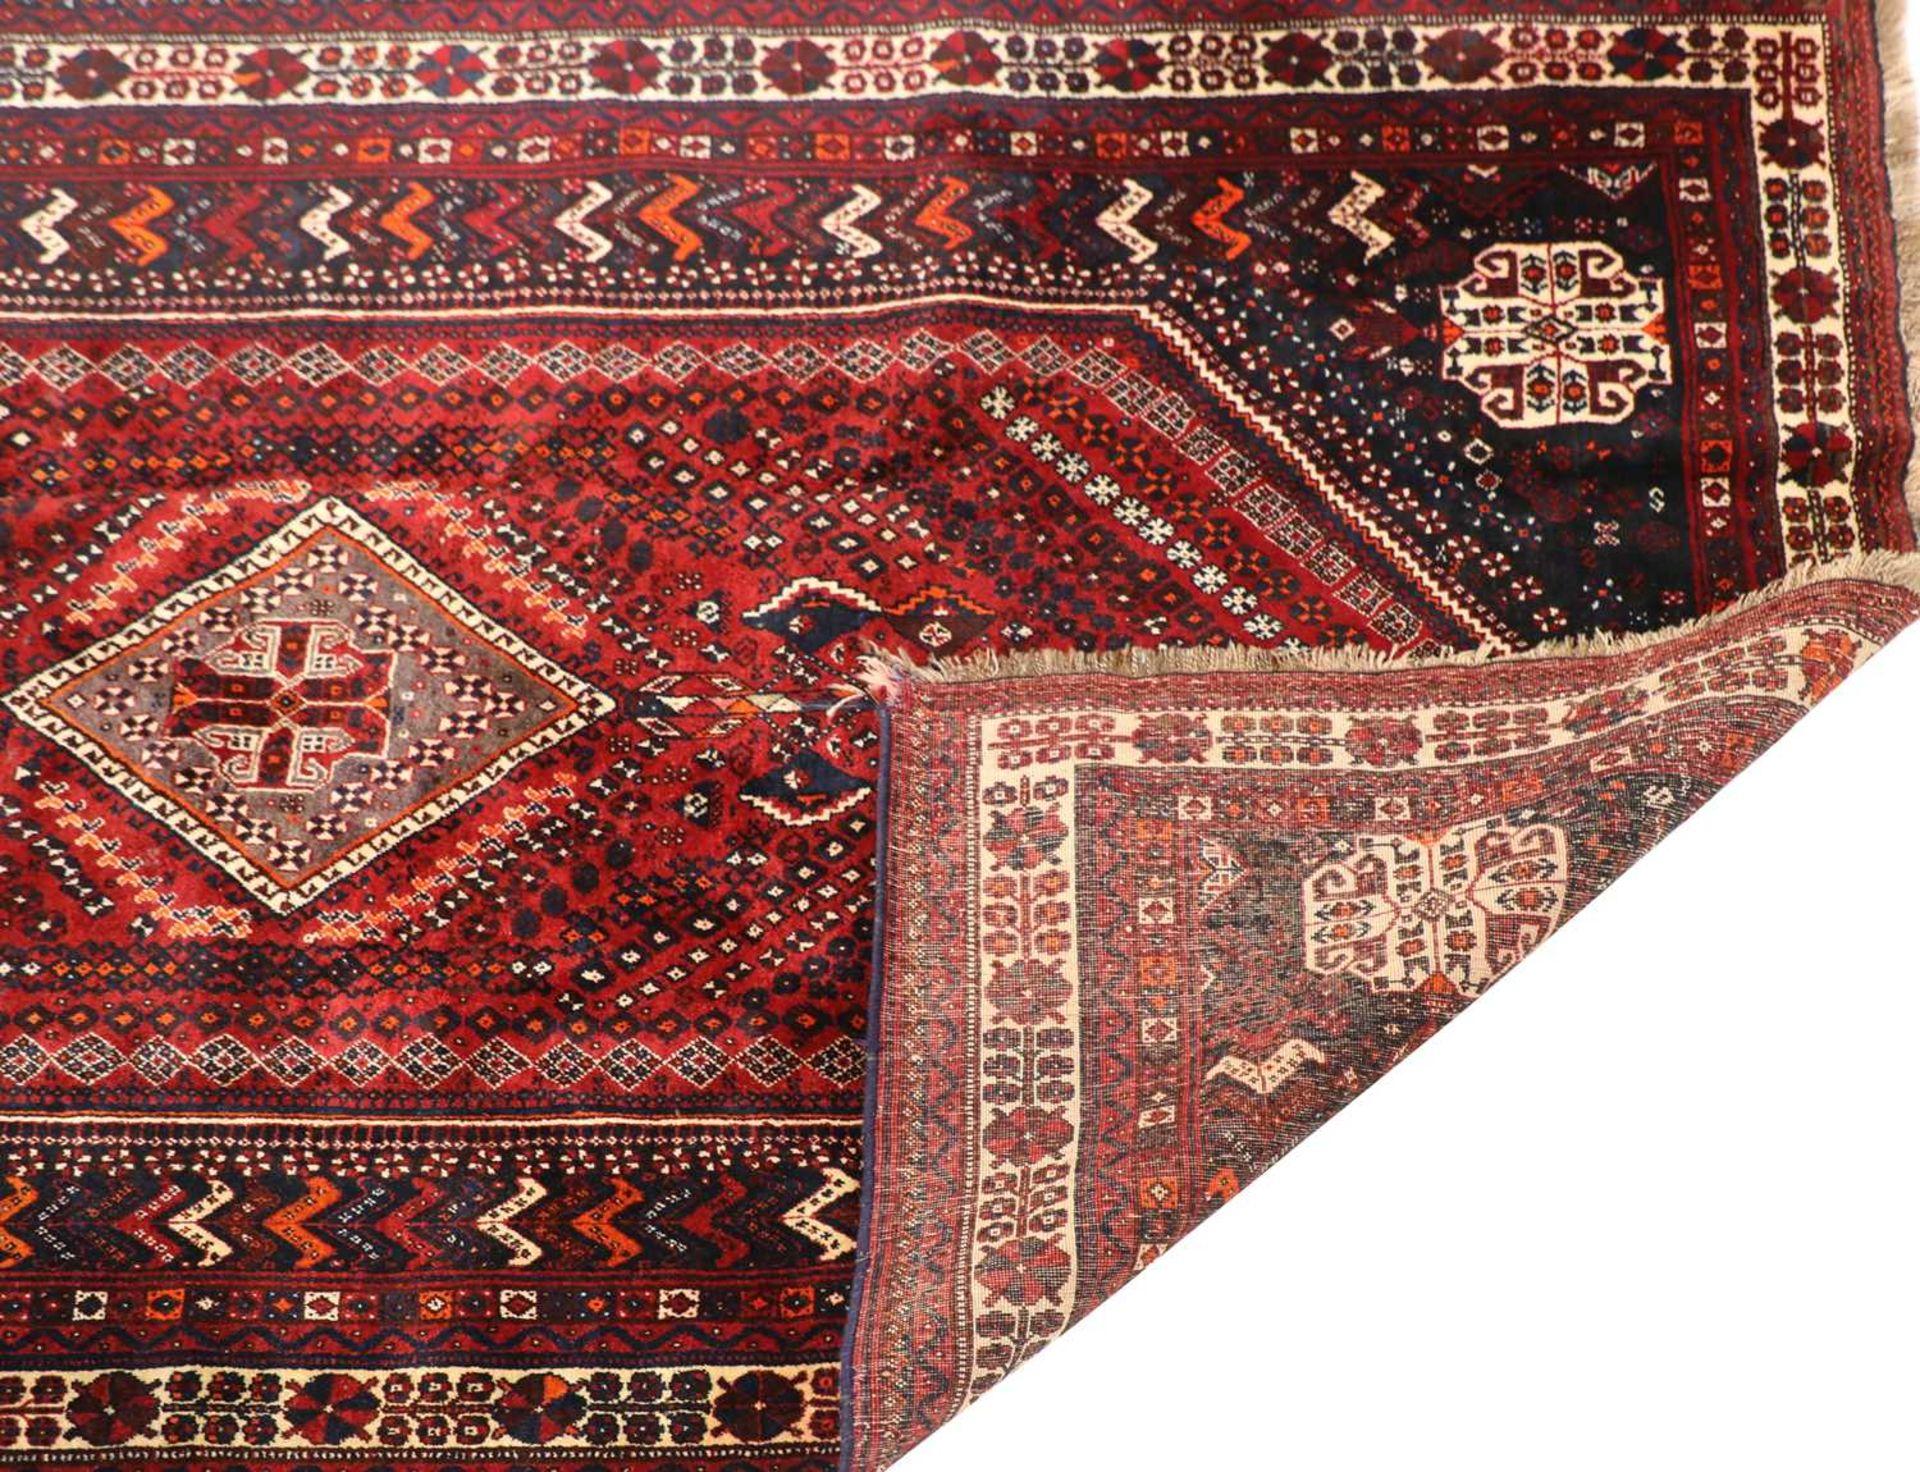 A Qashqai wool carpet, - Image 2 of 2